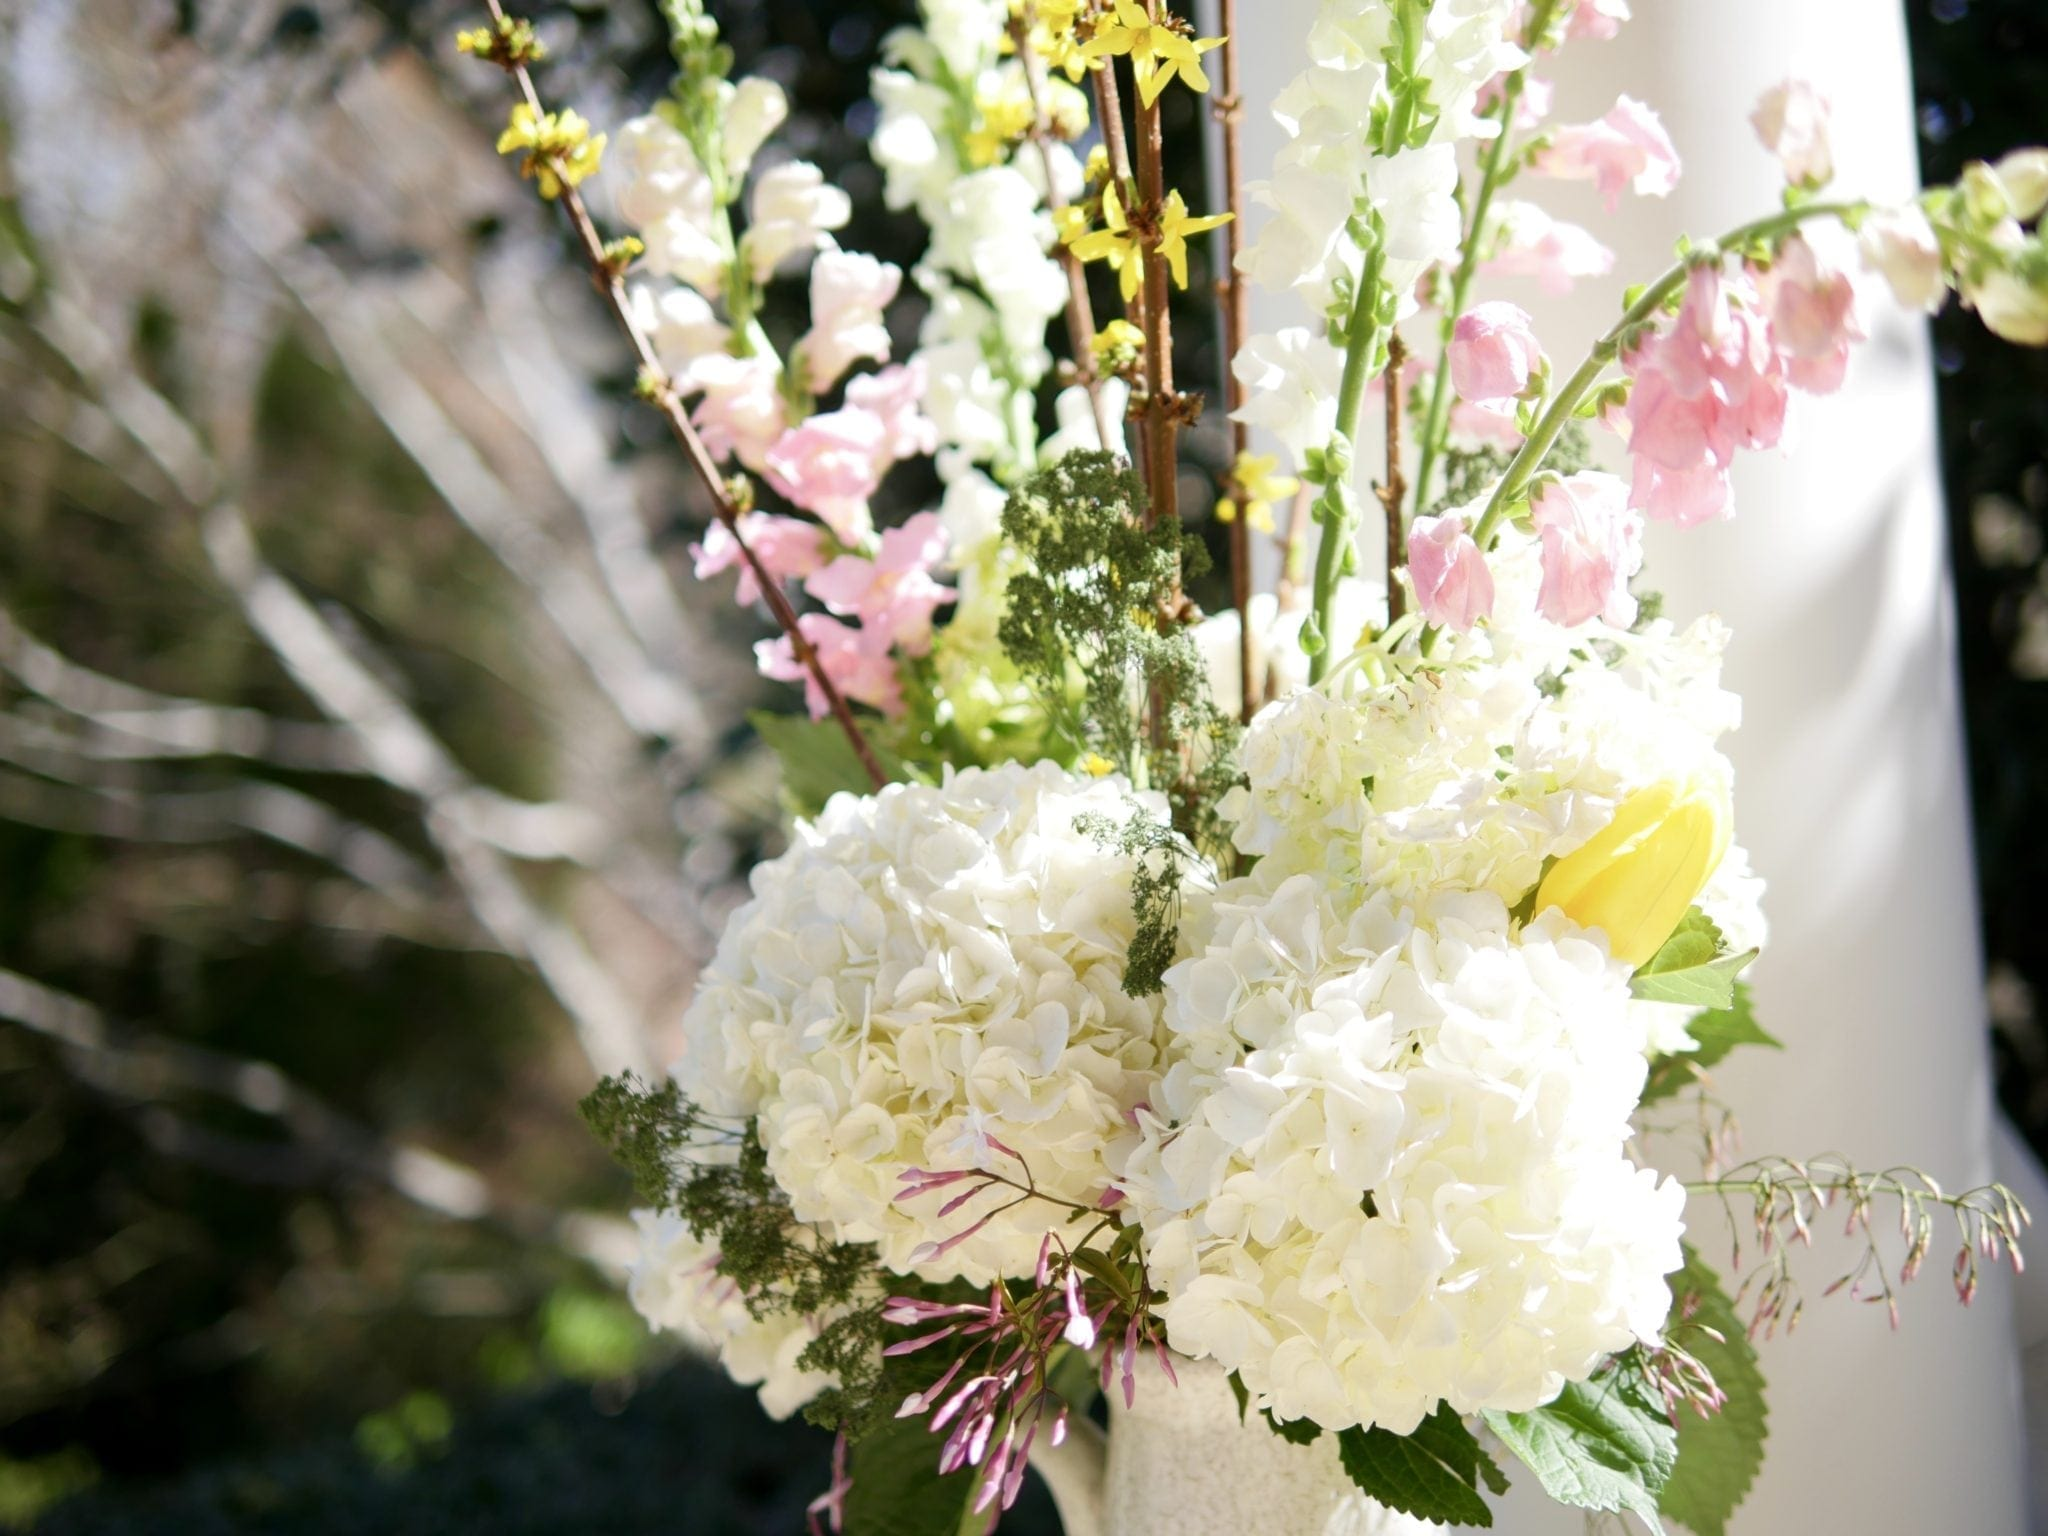 Spring flower arrangements with Snapdragons.